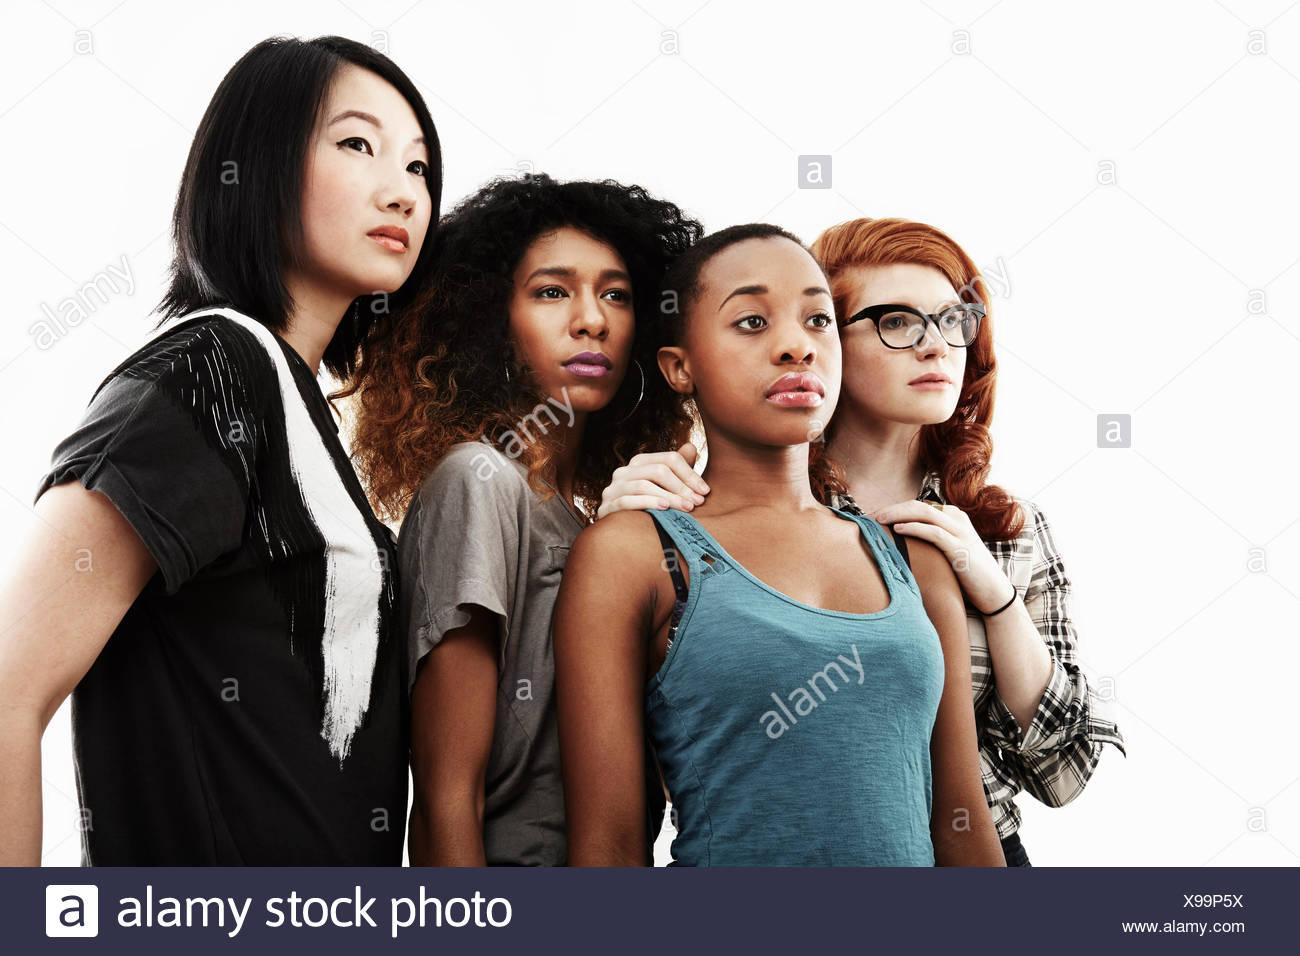 Studio portrait of four serious young women Stock Photo